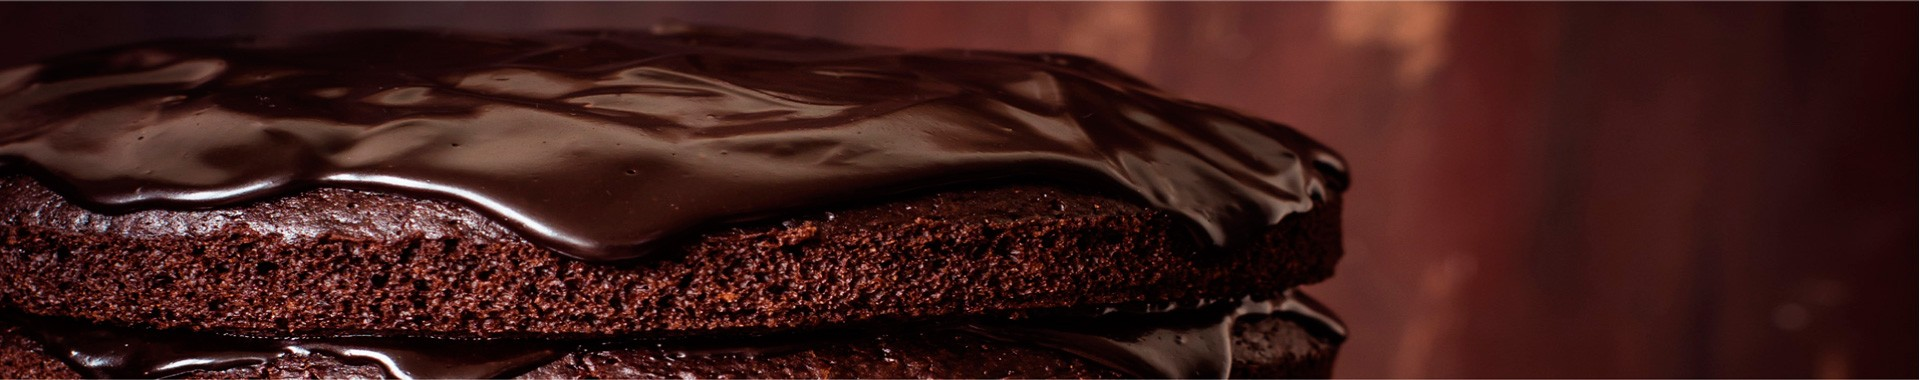 Pirámide de chocolate amargo